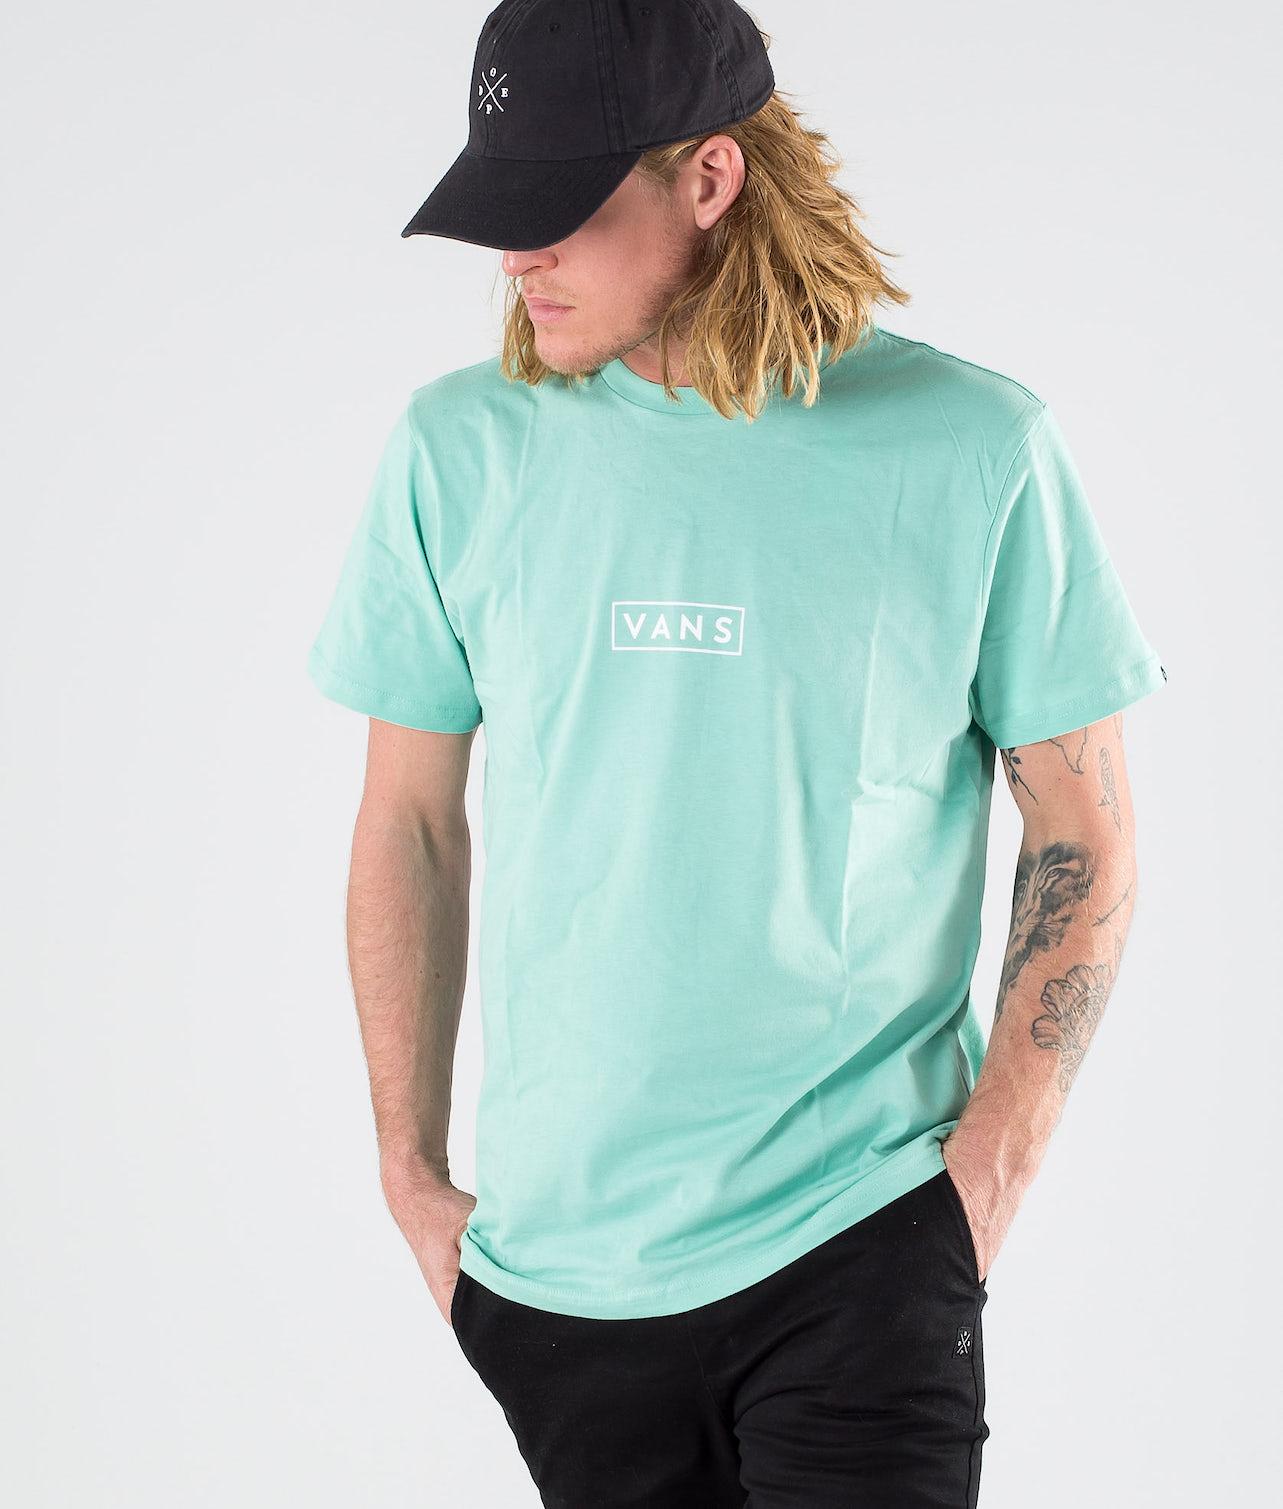 Vans Easy Box SS T-shirt Dusty Jade Green